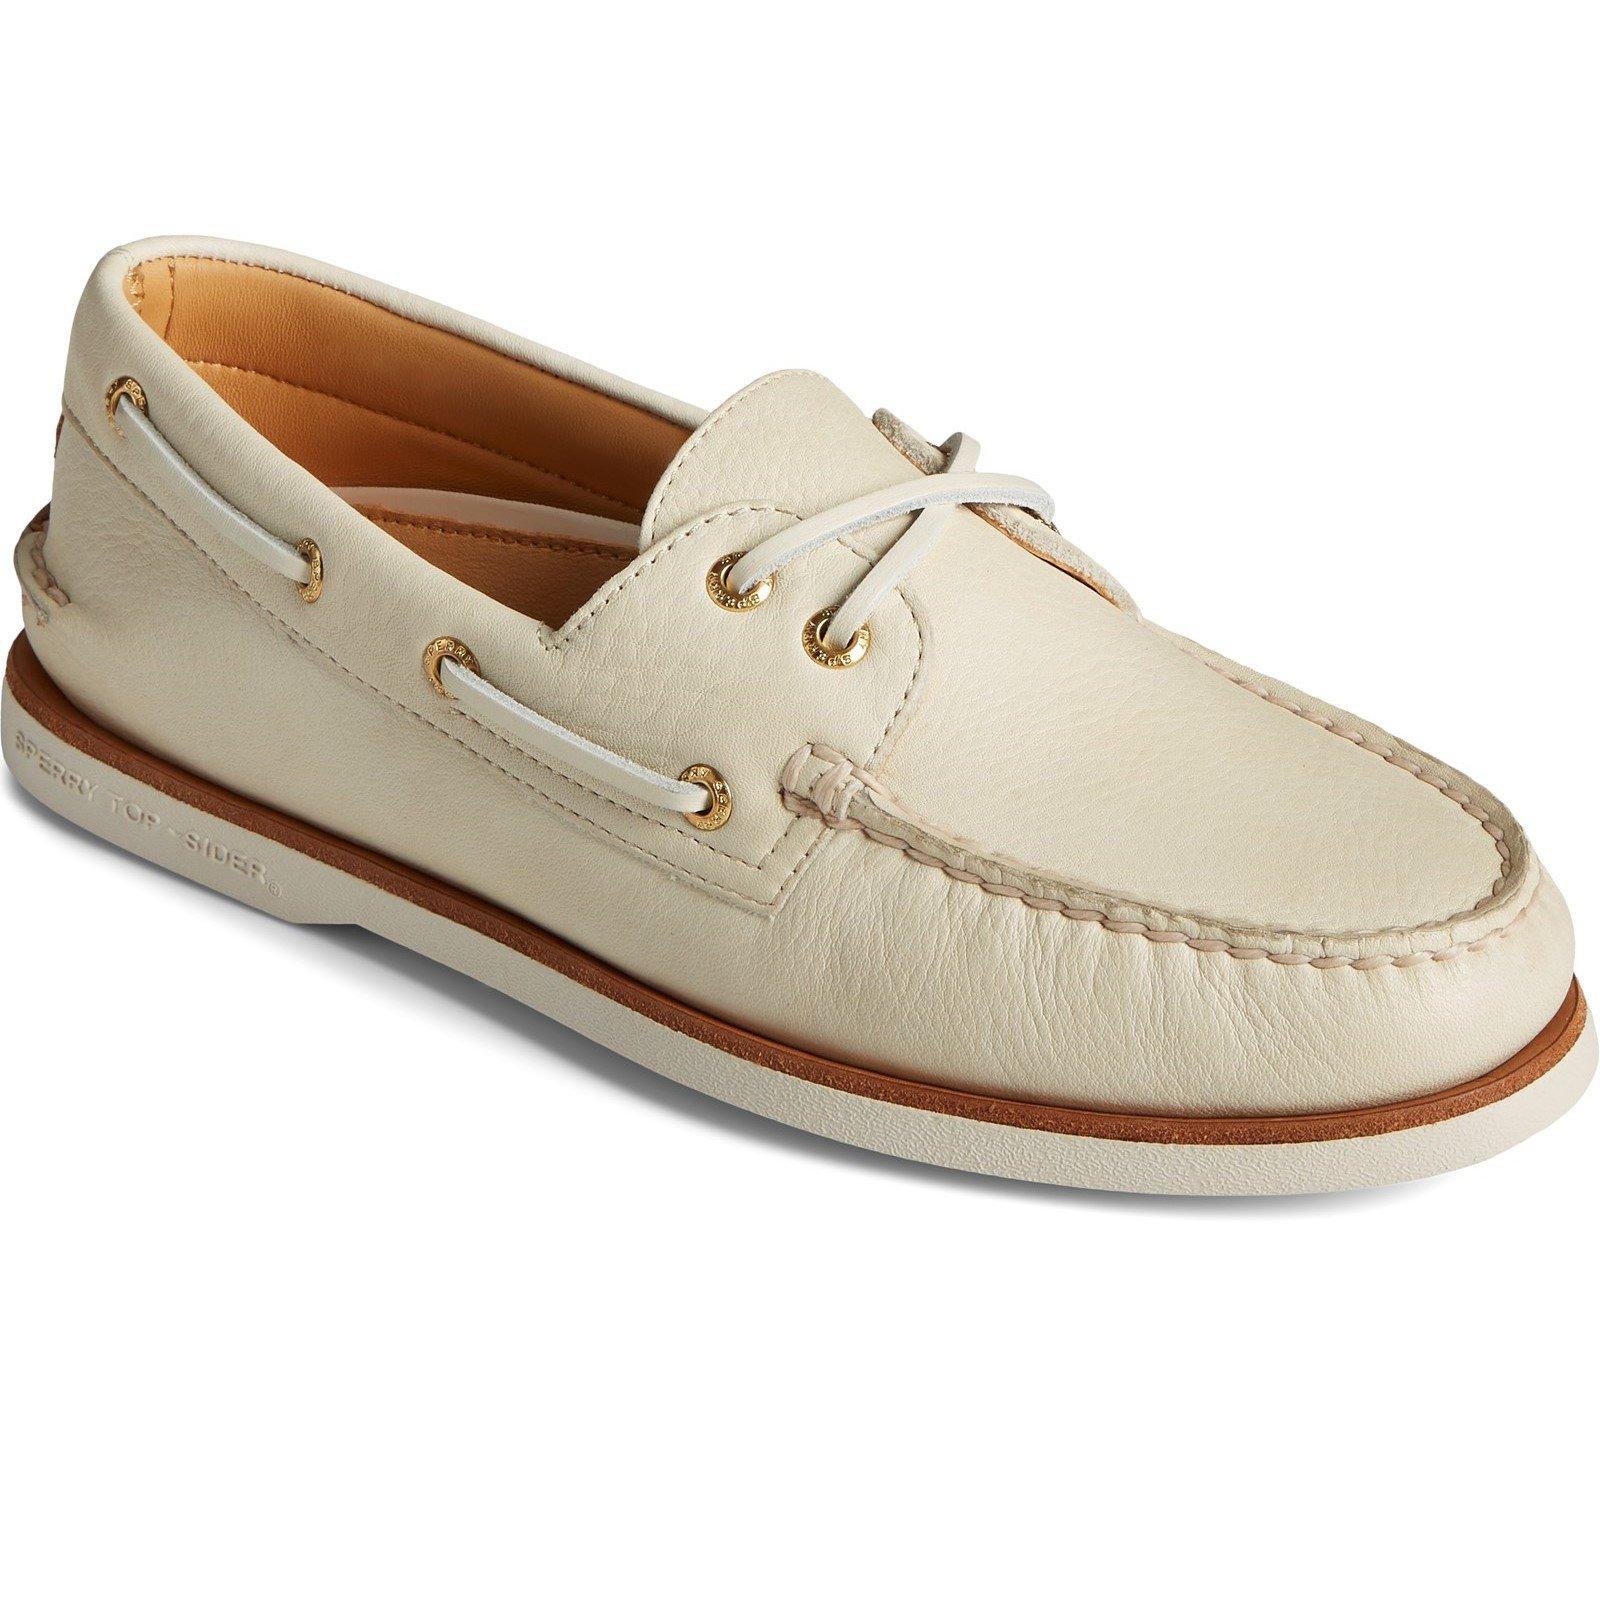 Sperry Men's A/O 2-Eye Boat Shoe Various Colours 32926 - Cream 8